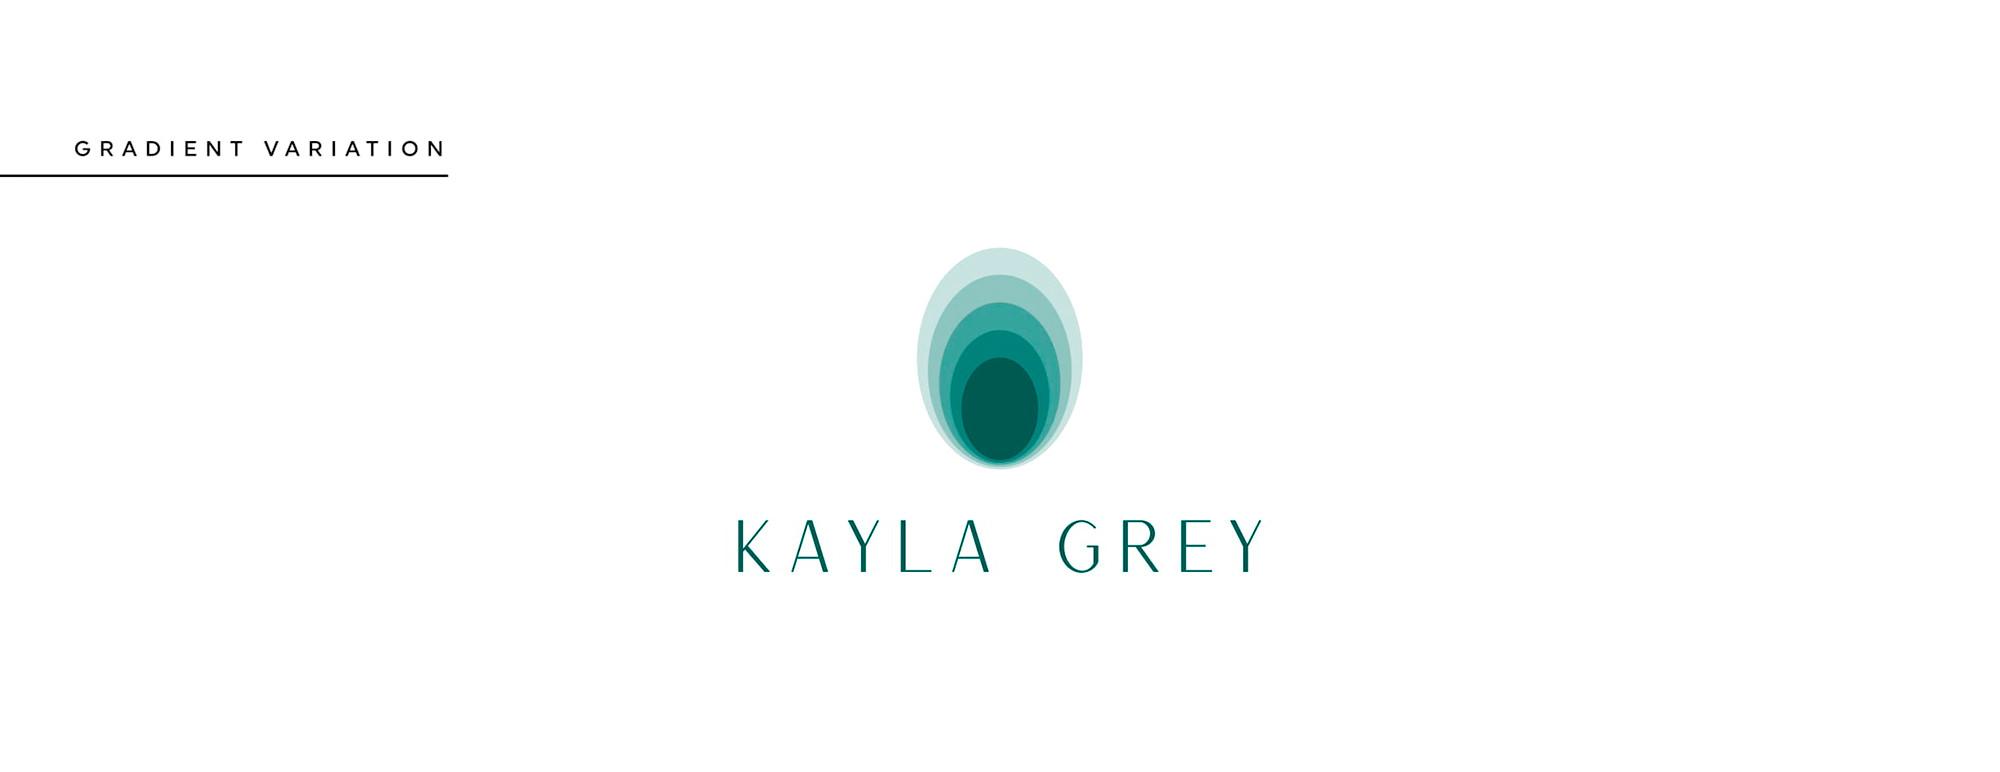 KaylaGrey_StyleGuide-3CROP.jpg